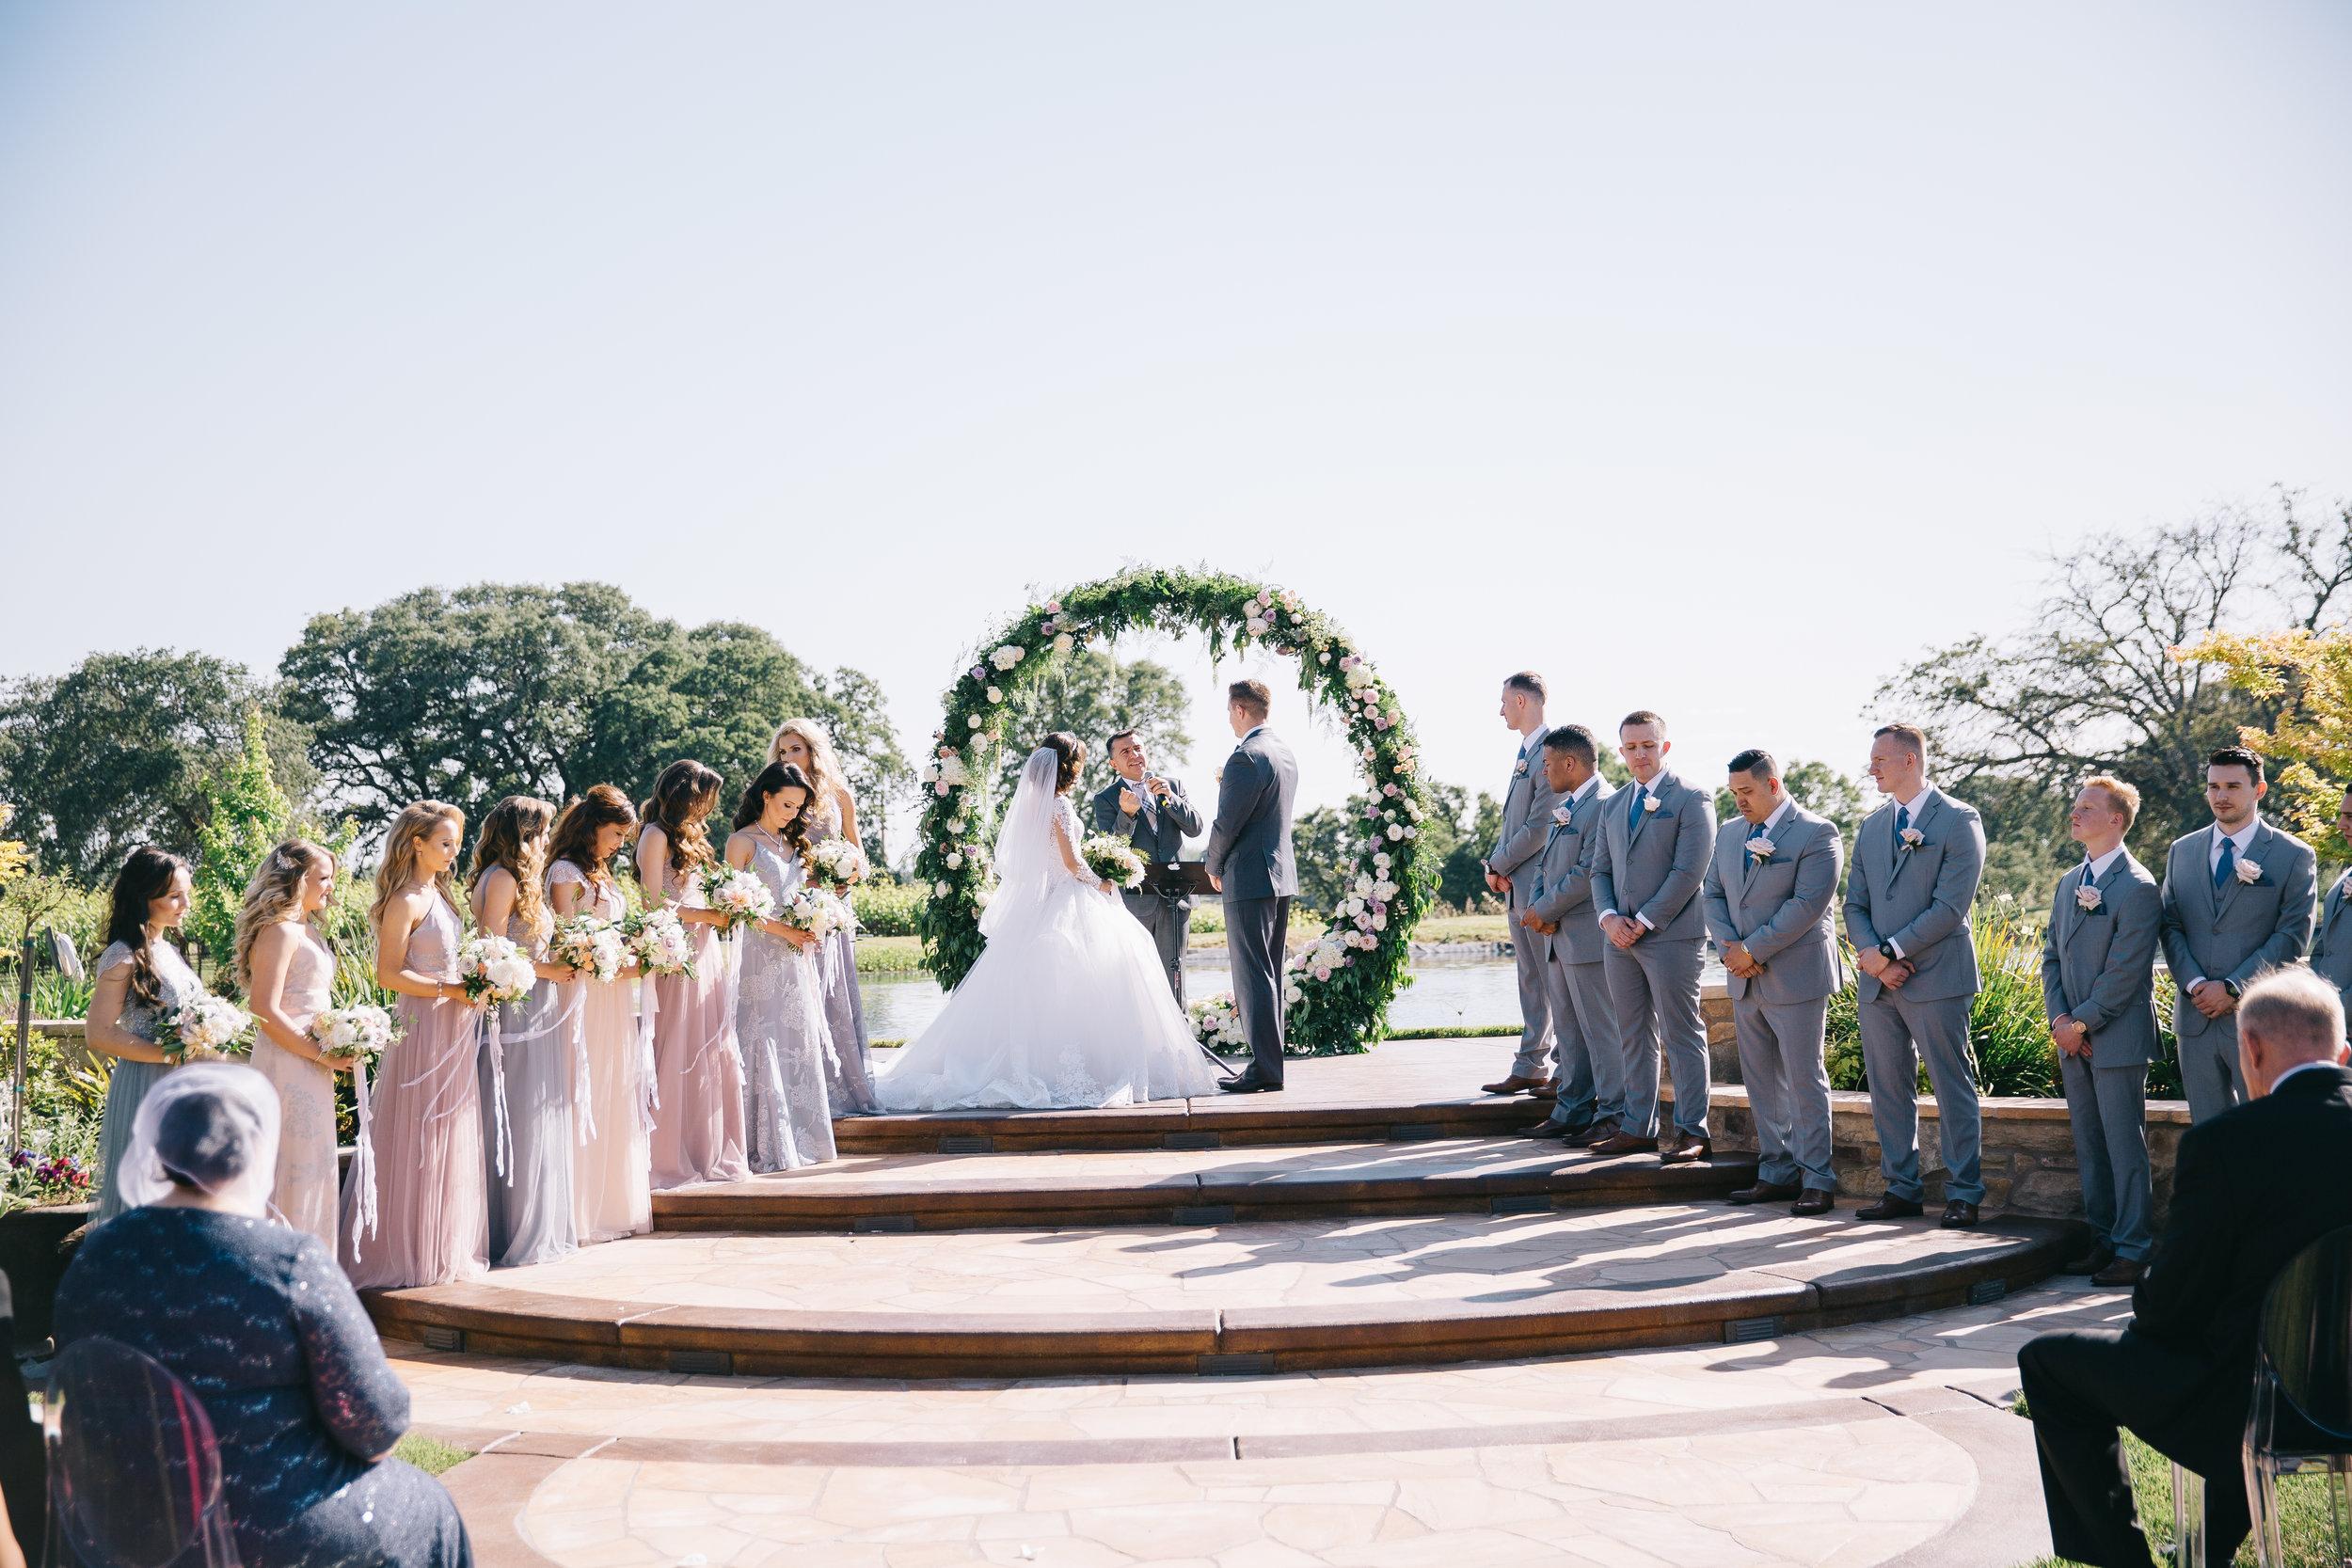 Violette-fleurs-anna-perevertaylo-White-Blush-elegant-flowers-for-wedding-decor-upscale-design-roseville-sacramento-california-rancho-robles-vinyards-lincoln-elegant-luxury-bridesmaids-groomsmen-ceremony-infinity-ring.jpg